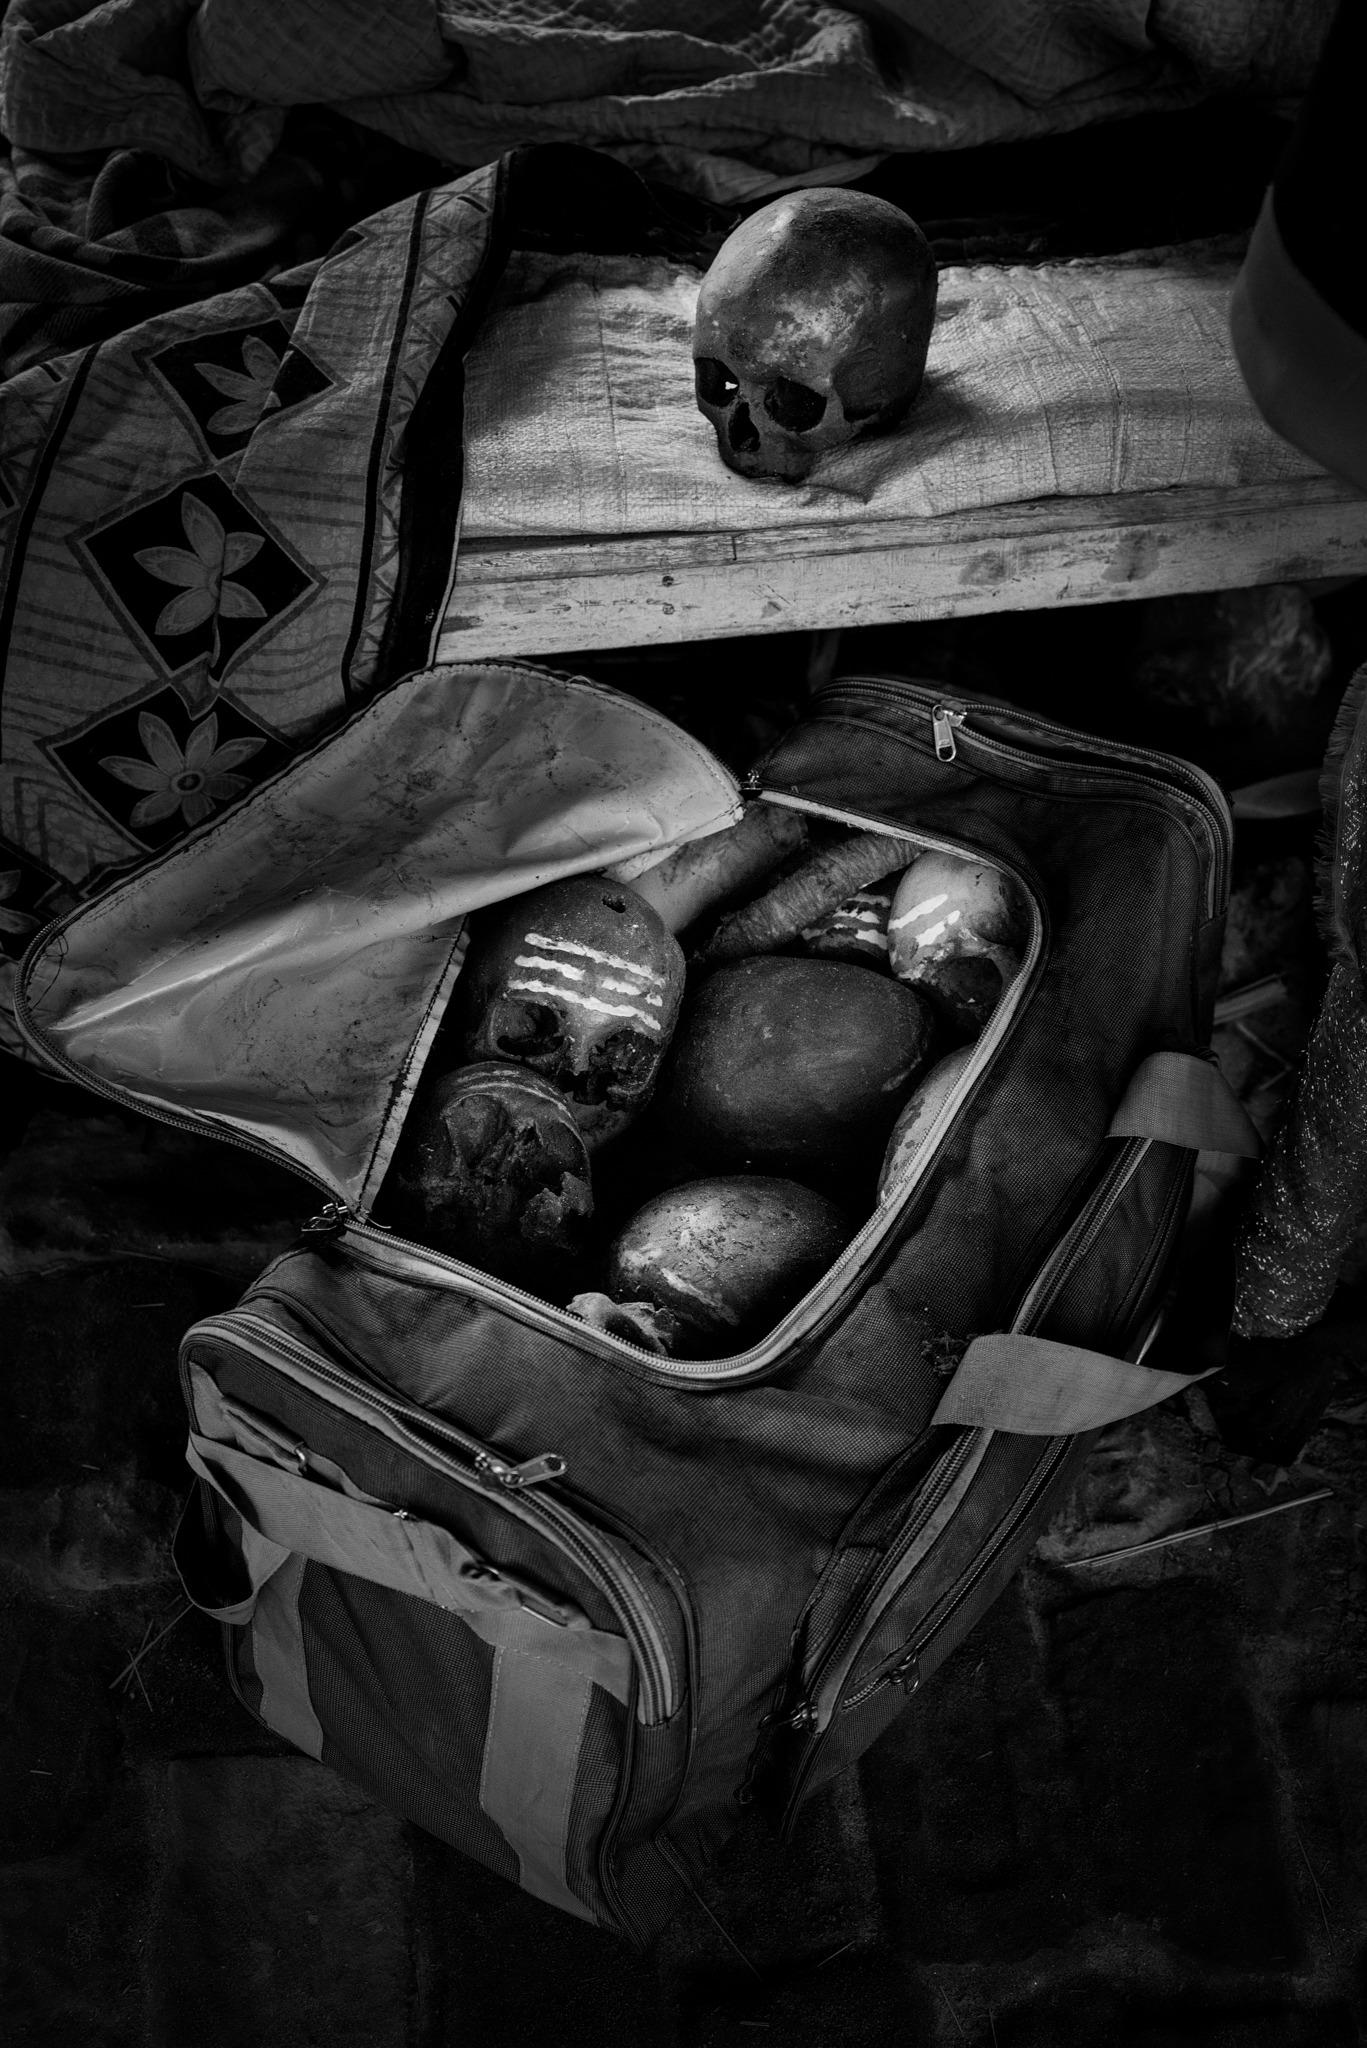 Human skulls in Aghori ashram